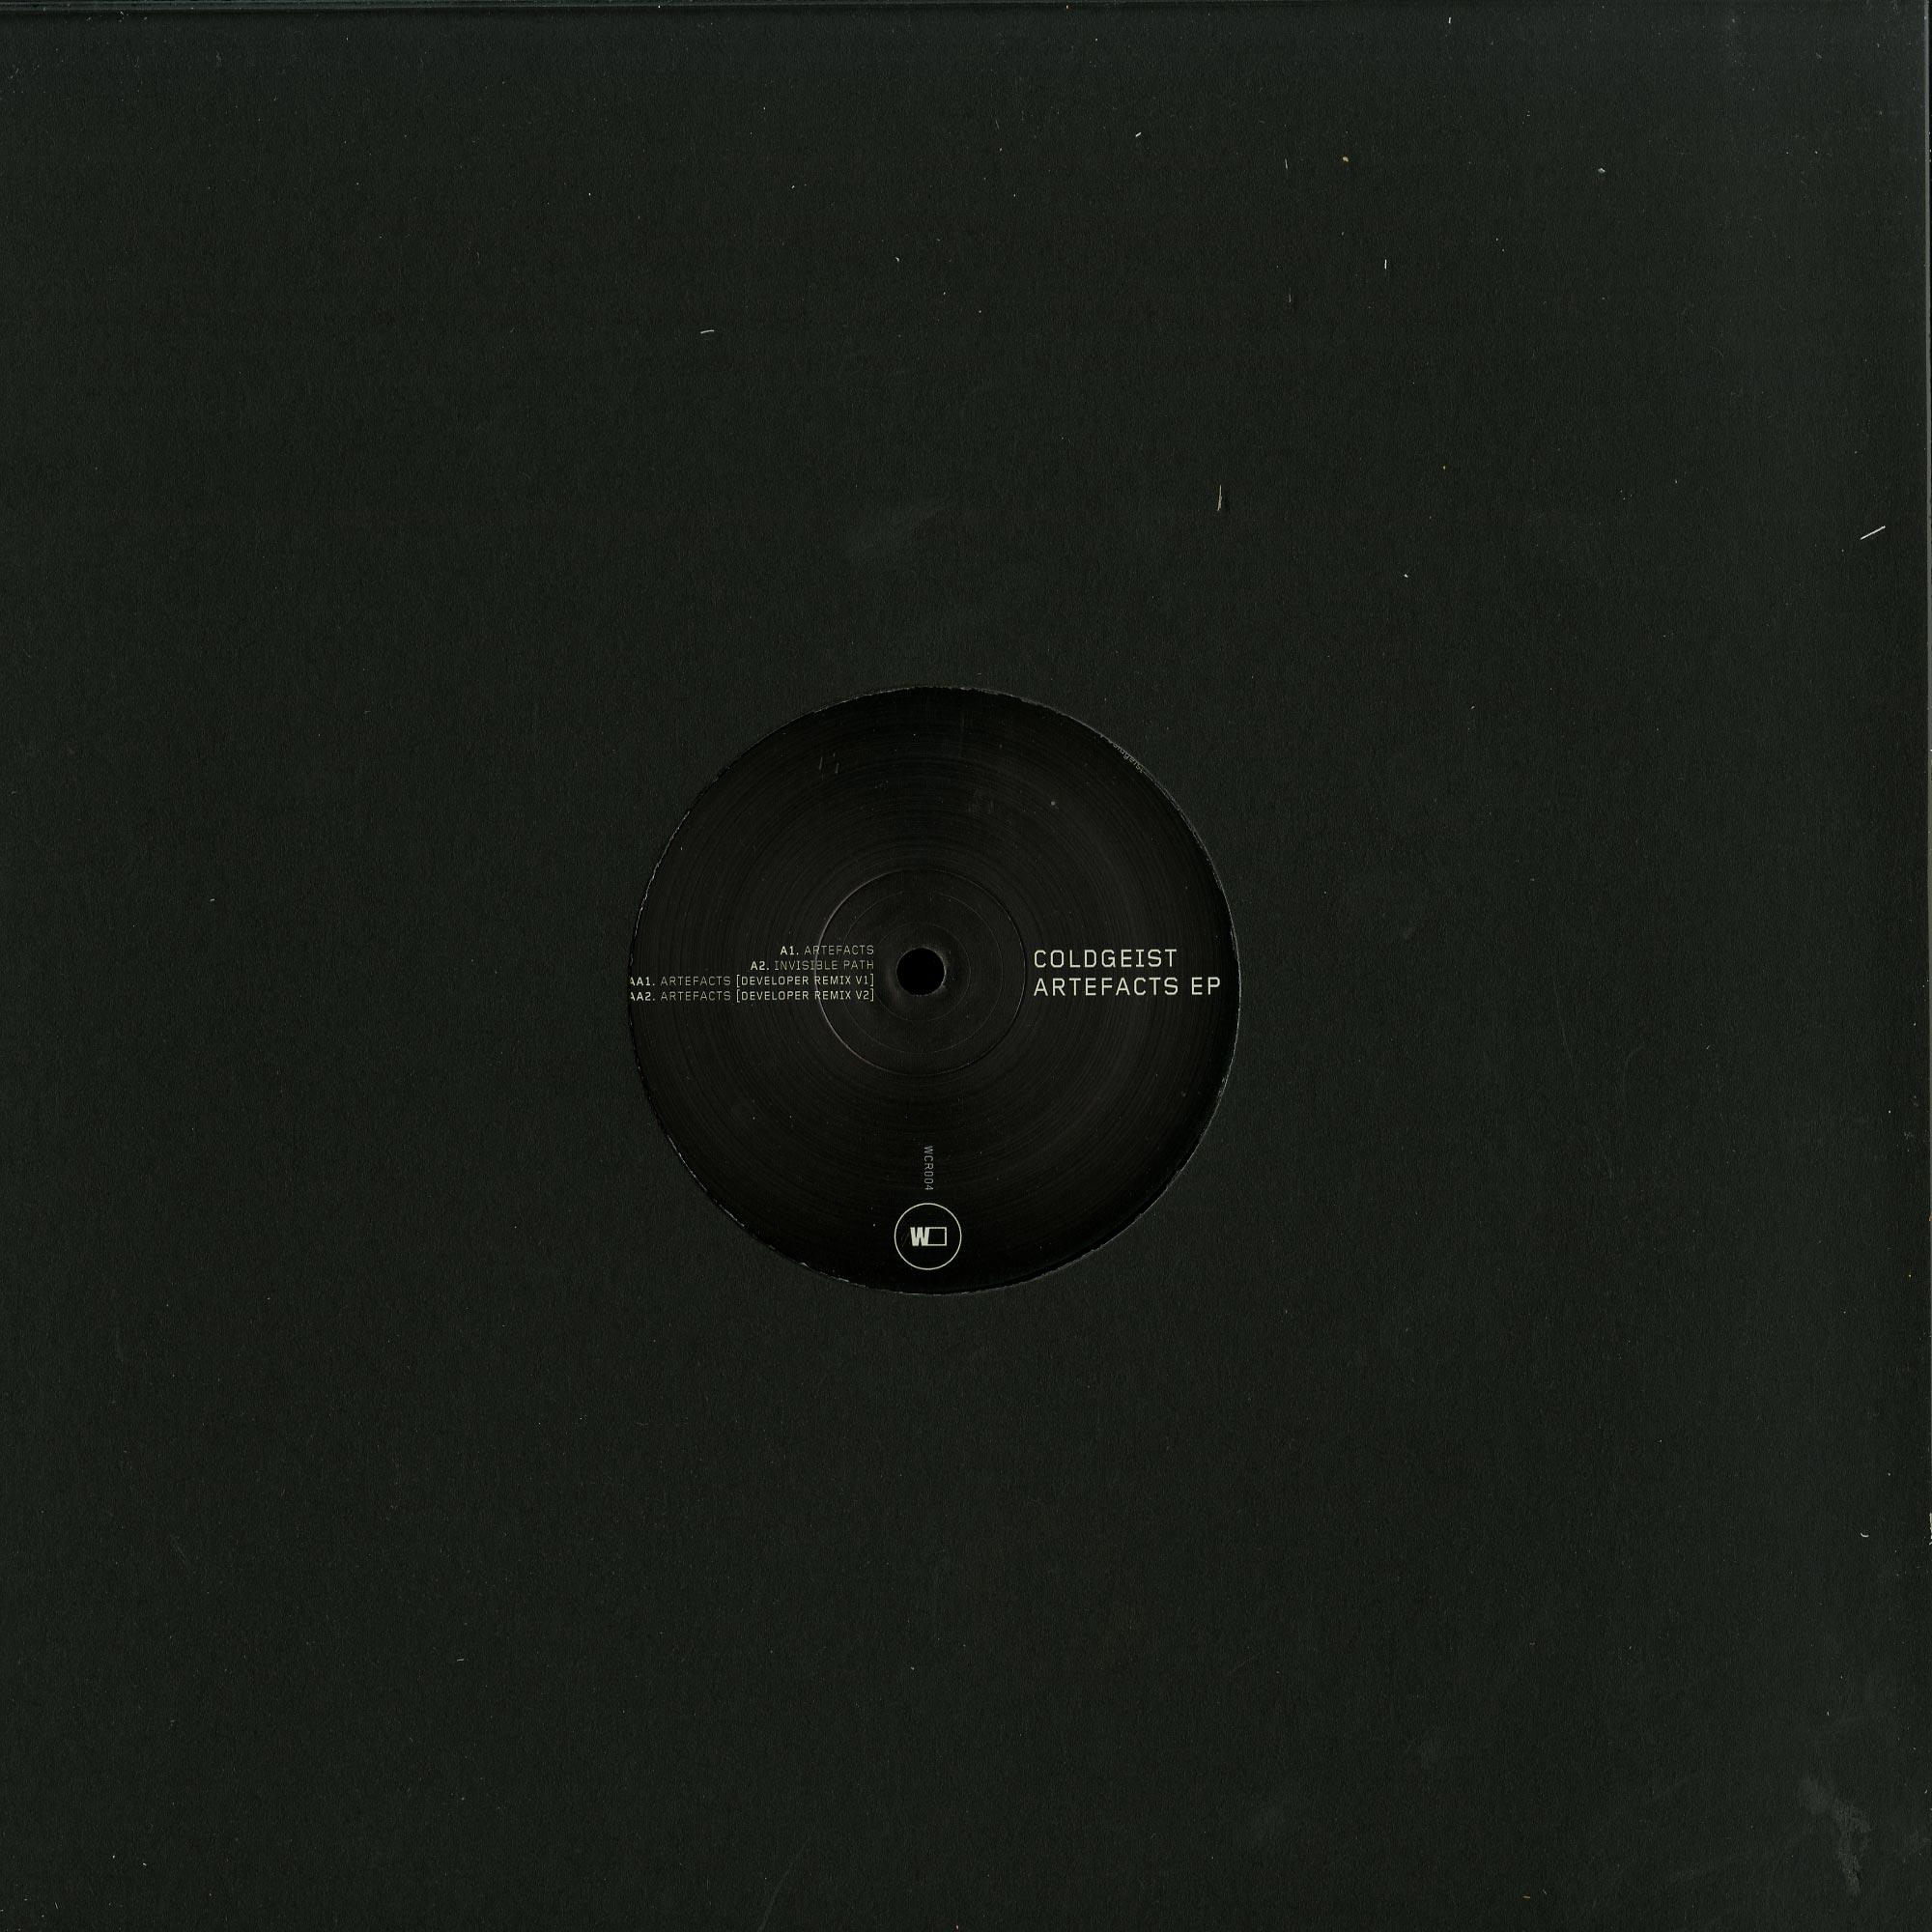 Coldgeist - ARTEFACTS